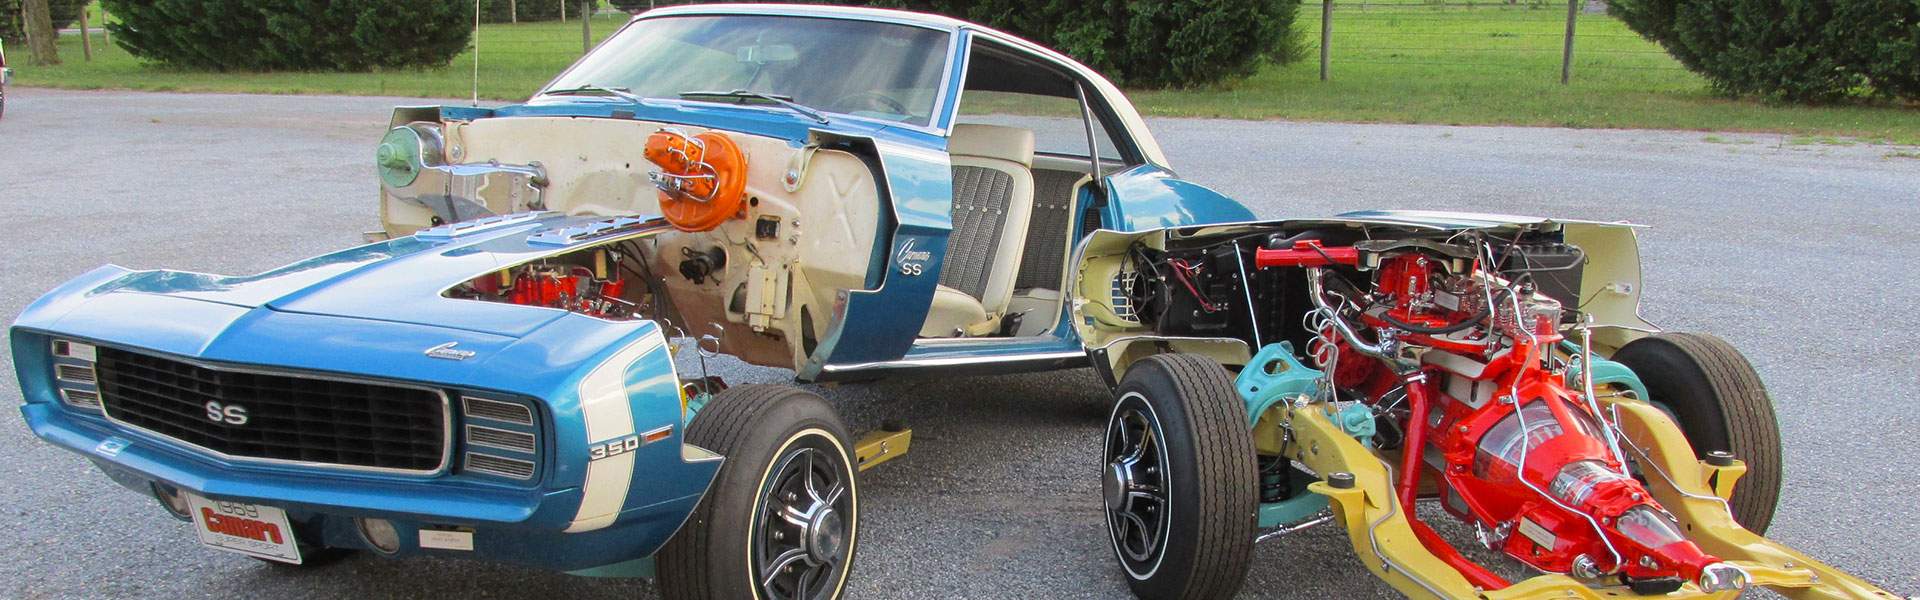 1969 Chevrolet Camaro SS Cut Away Display Car